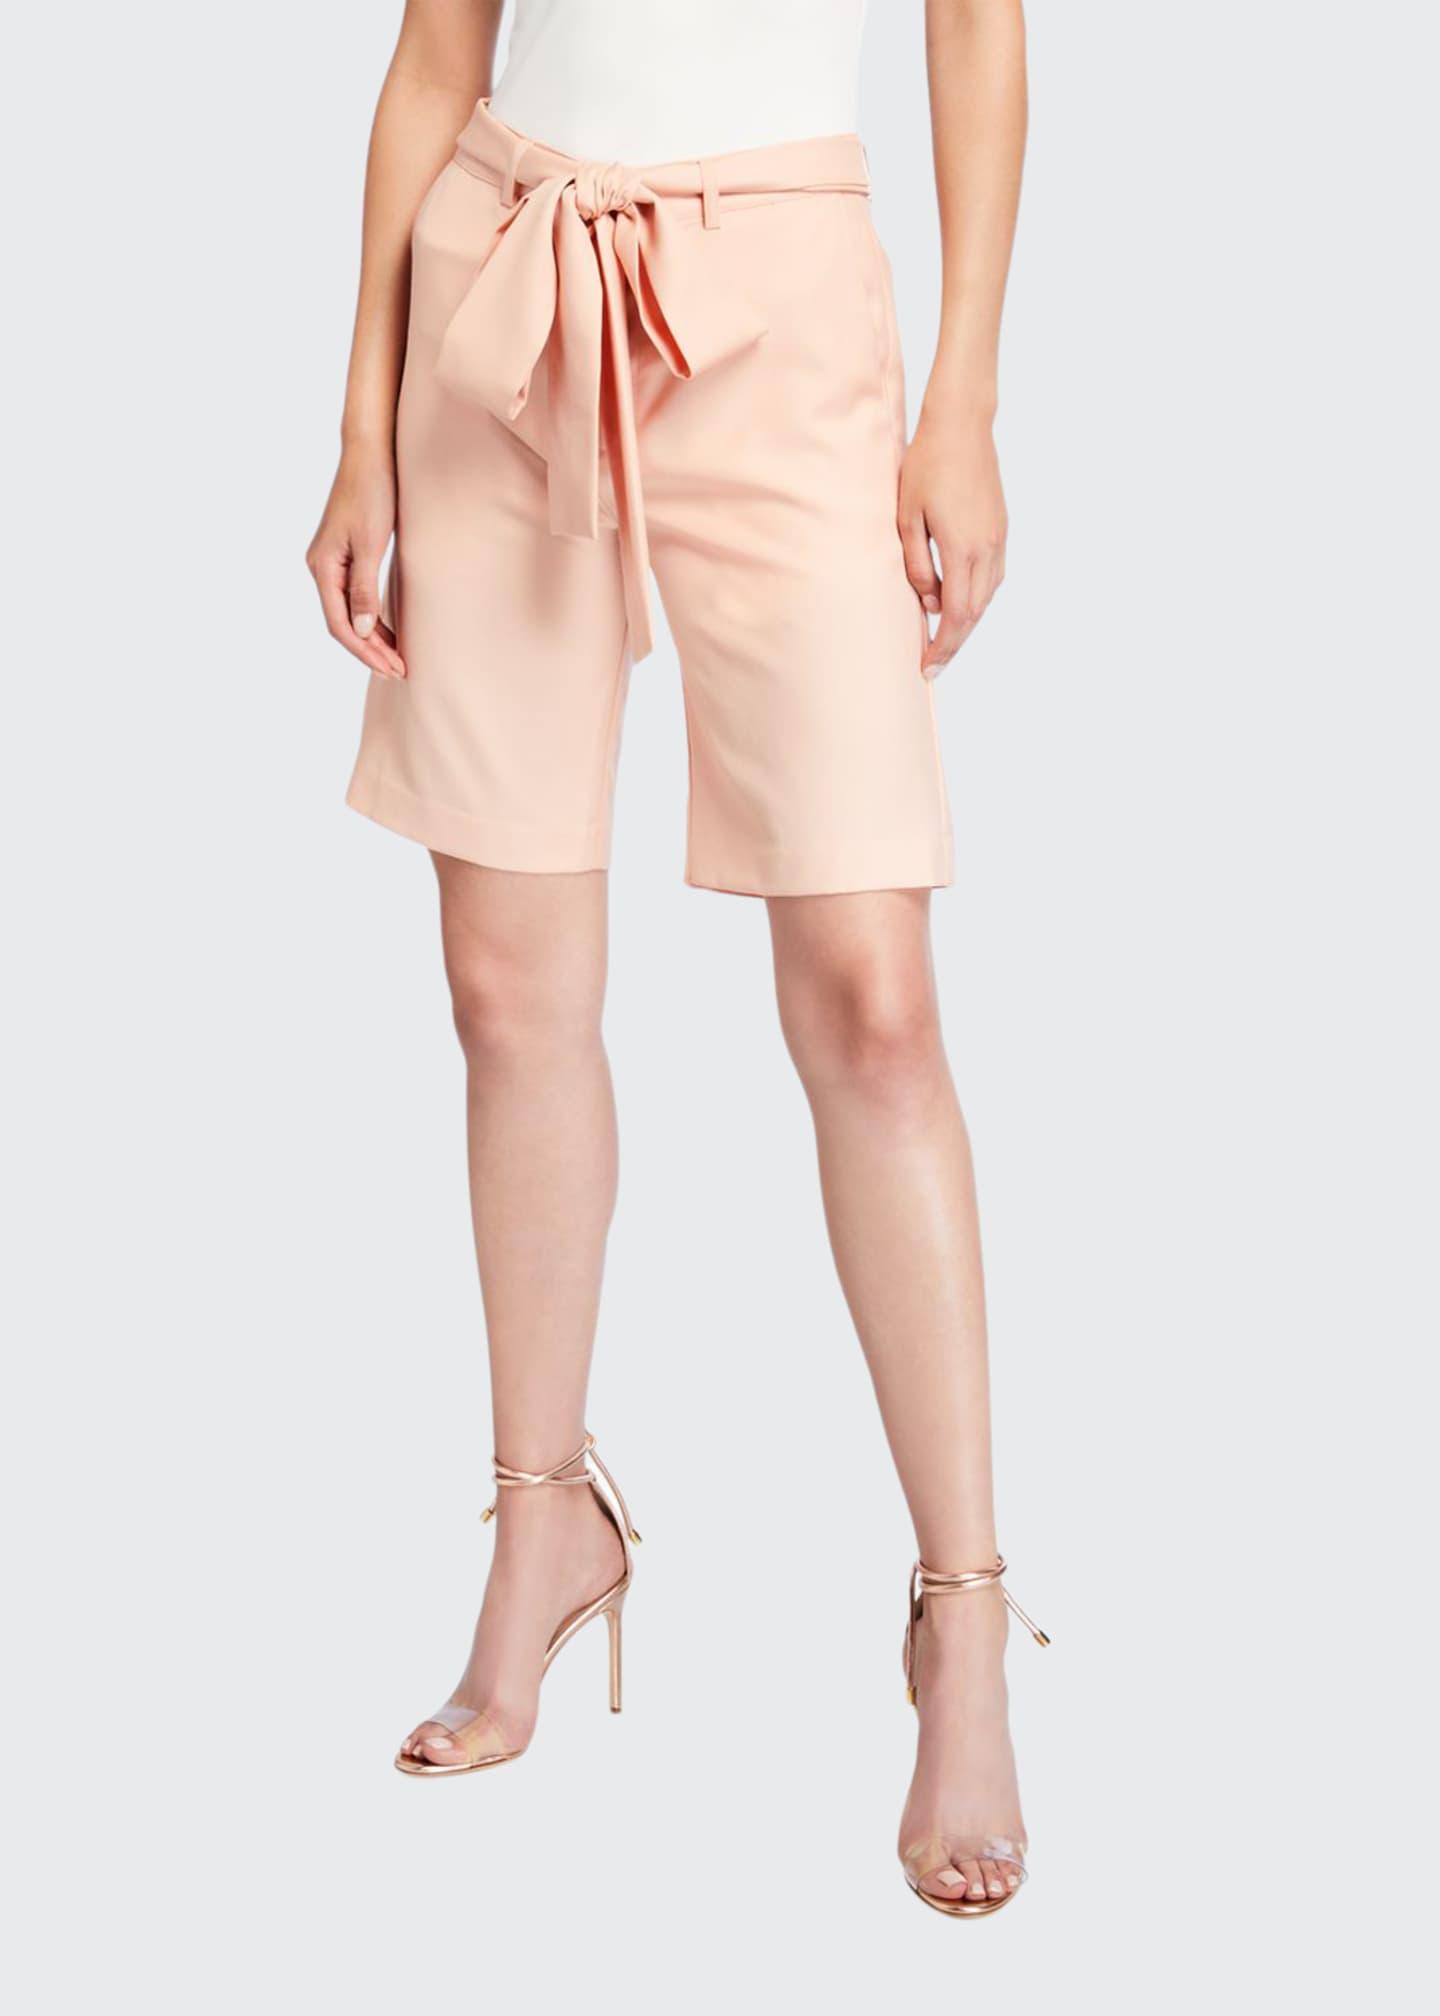 Maggie Marilyn Feeling Peachy Tie-Waist Shorts